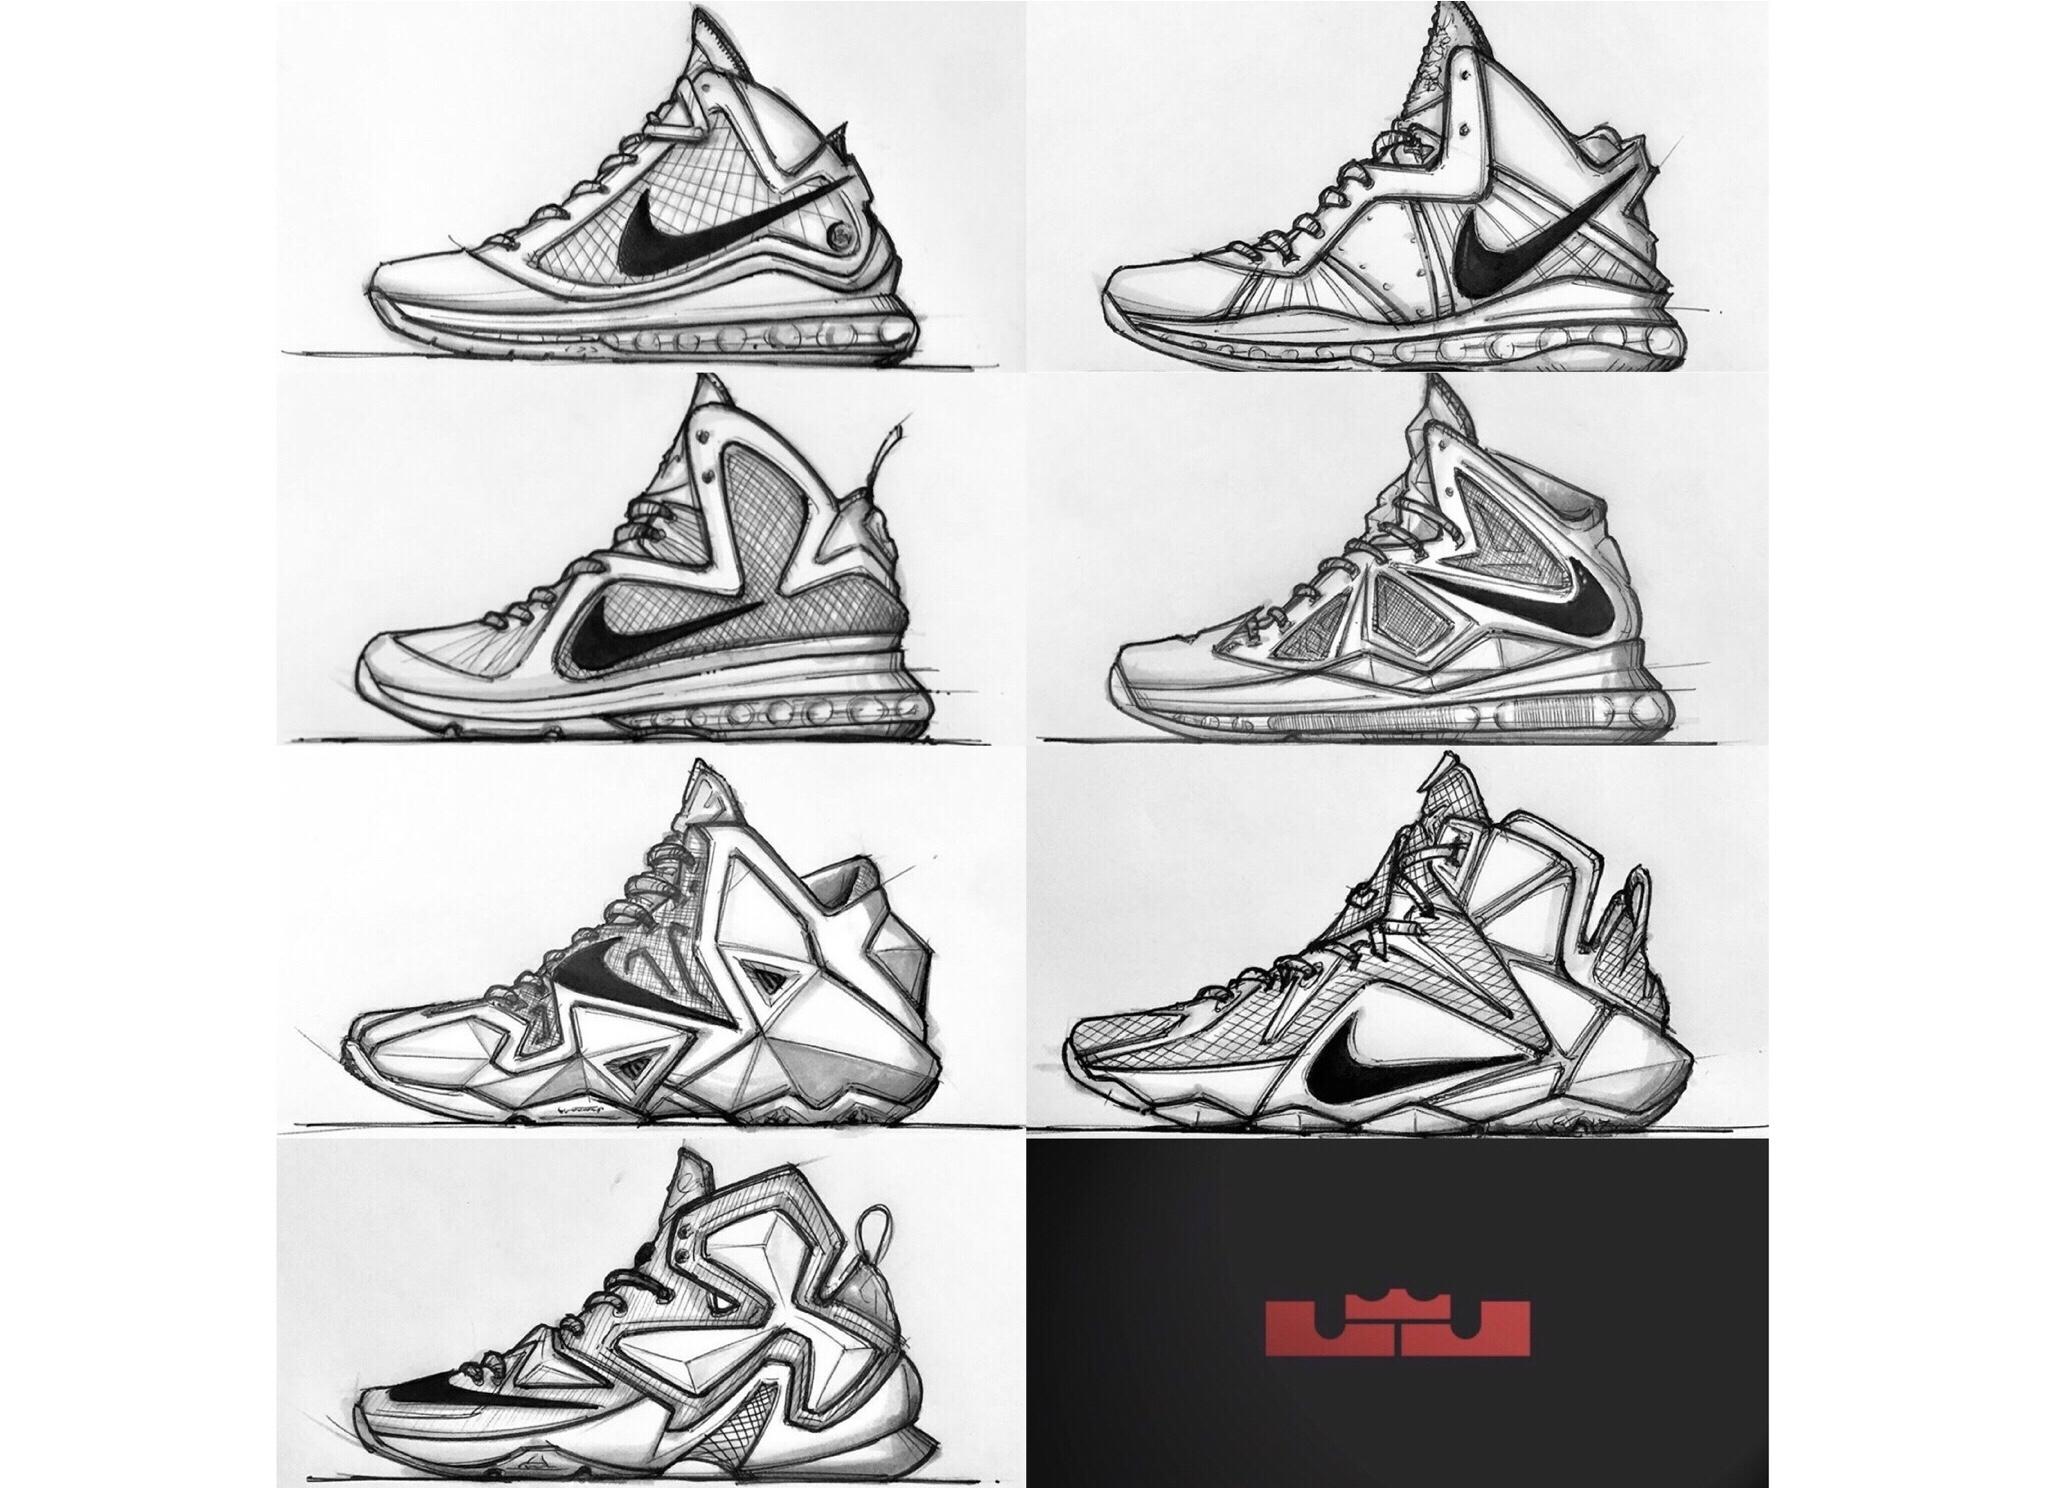 Ranking Lebron's 17 Signature Sneakers